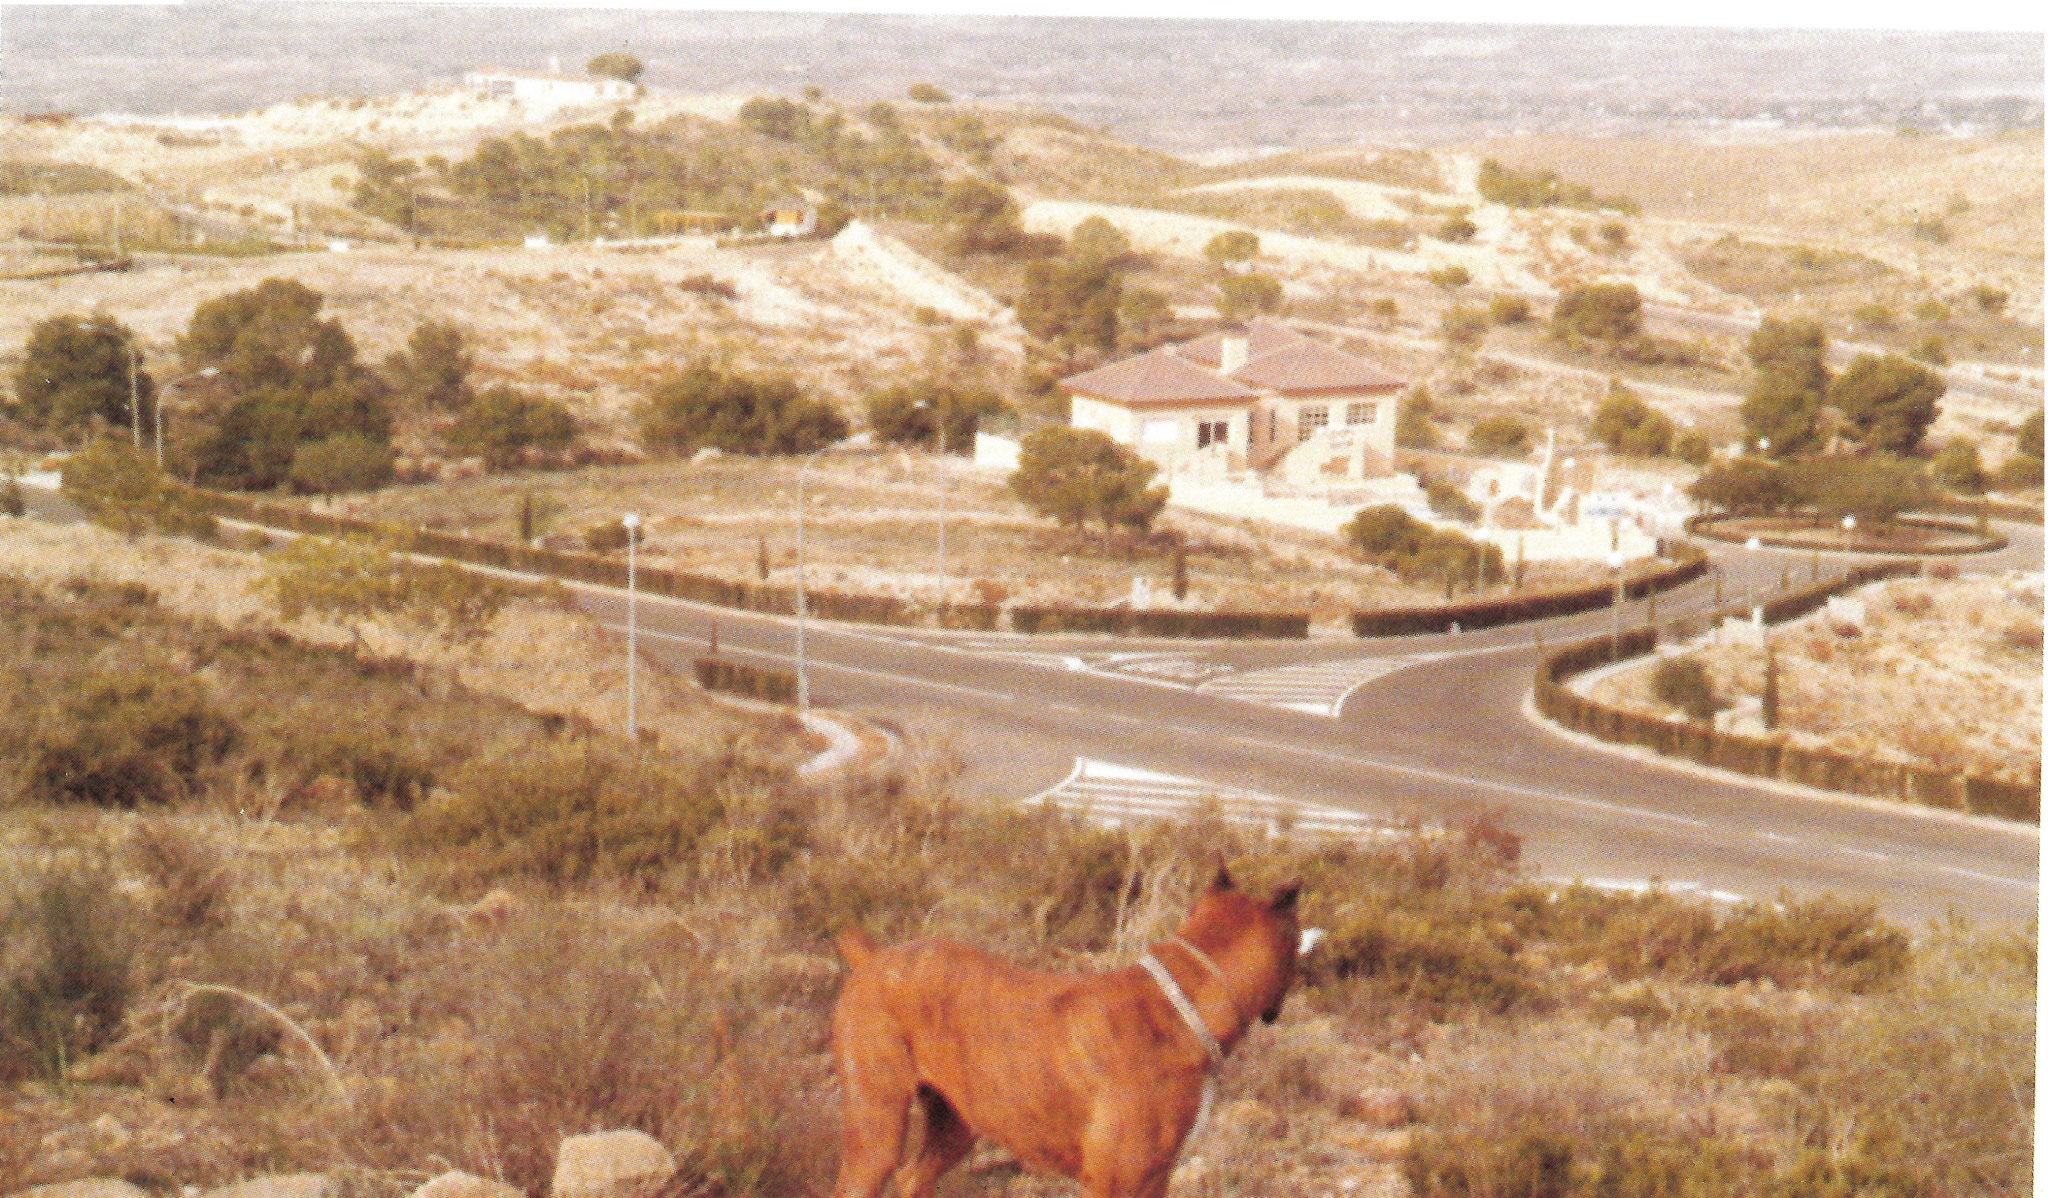 Avenida Reino de Murcia y Calle Aurora